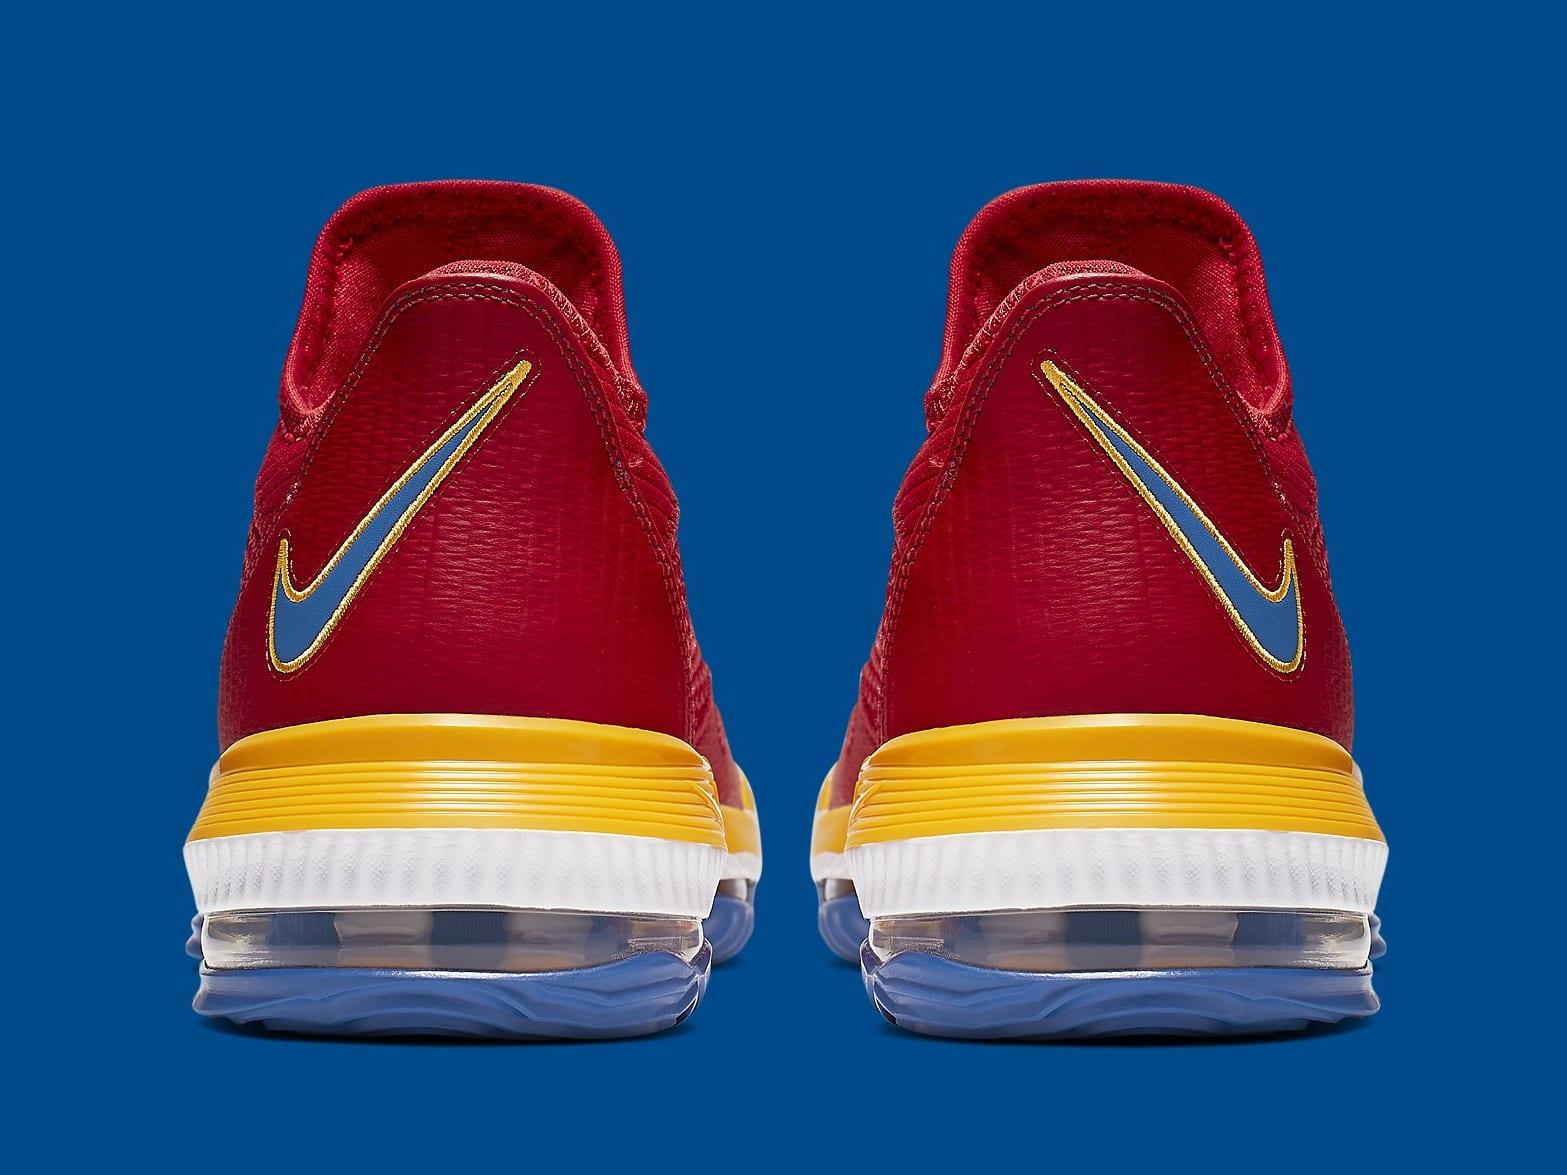 Nike LeBron 16 Low SuperBron Release Date CK2168-600 Heel